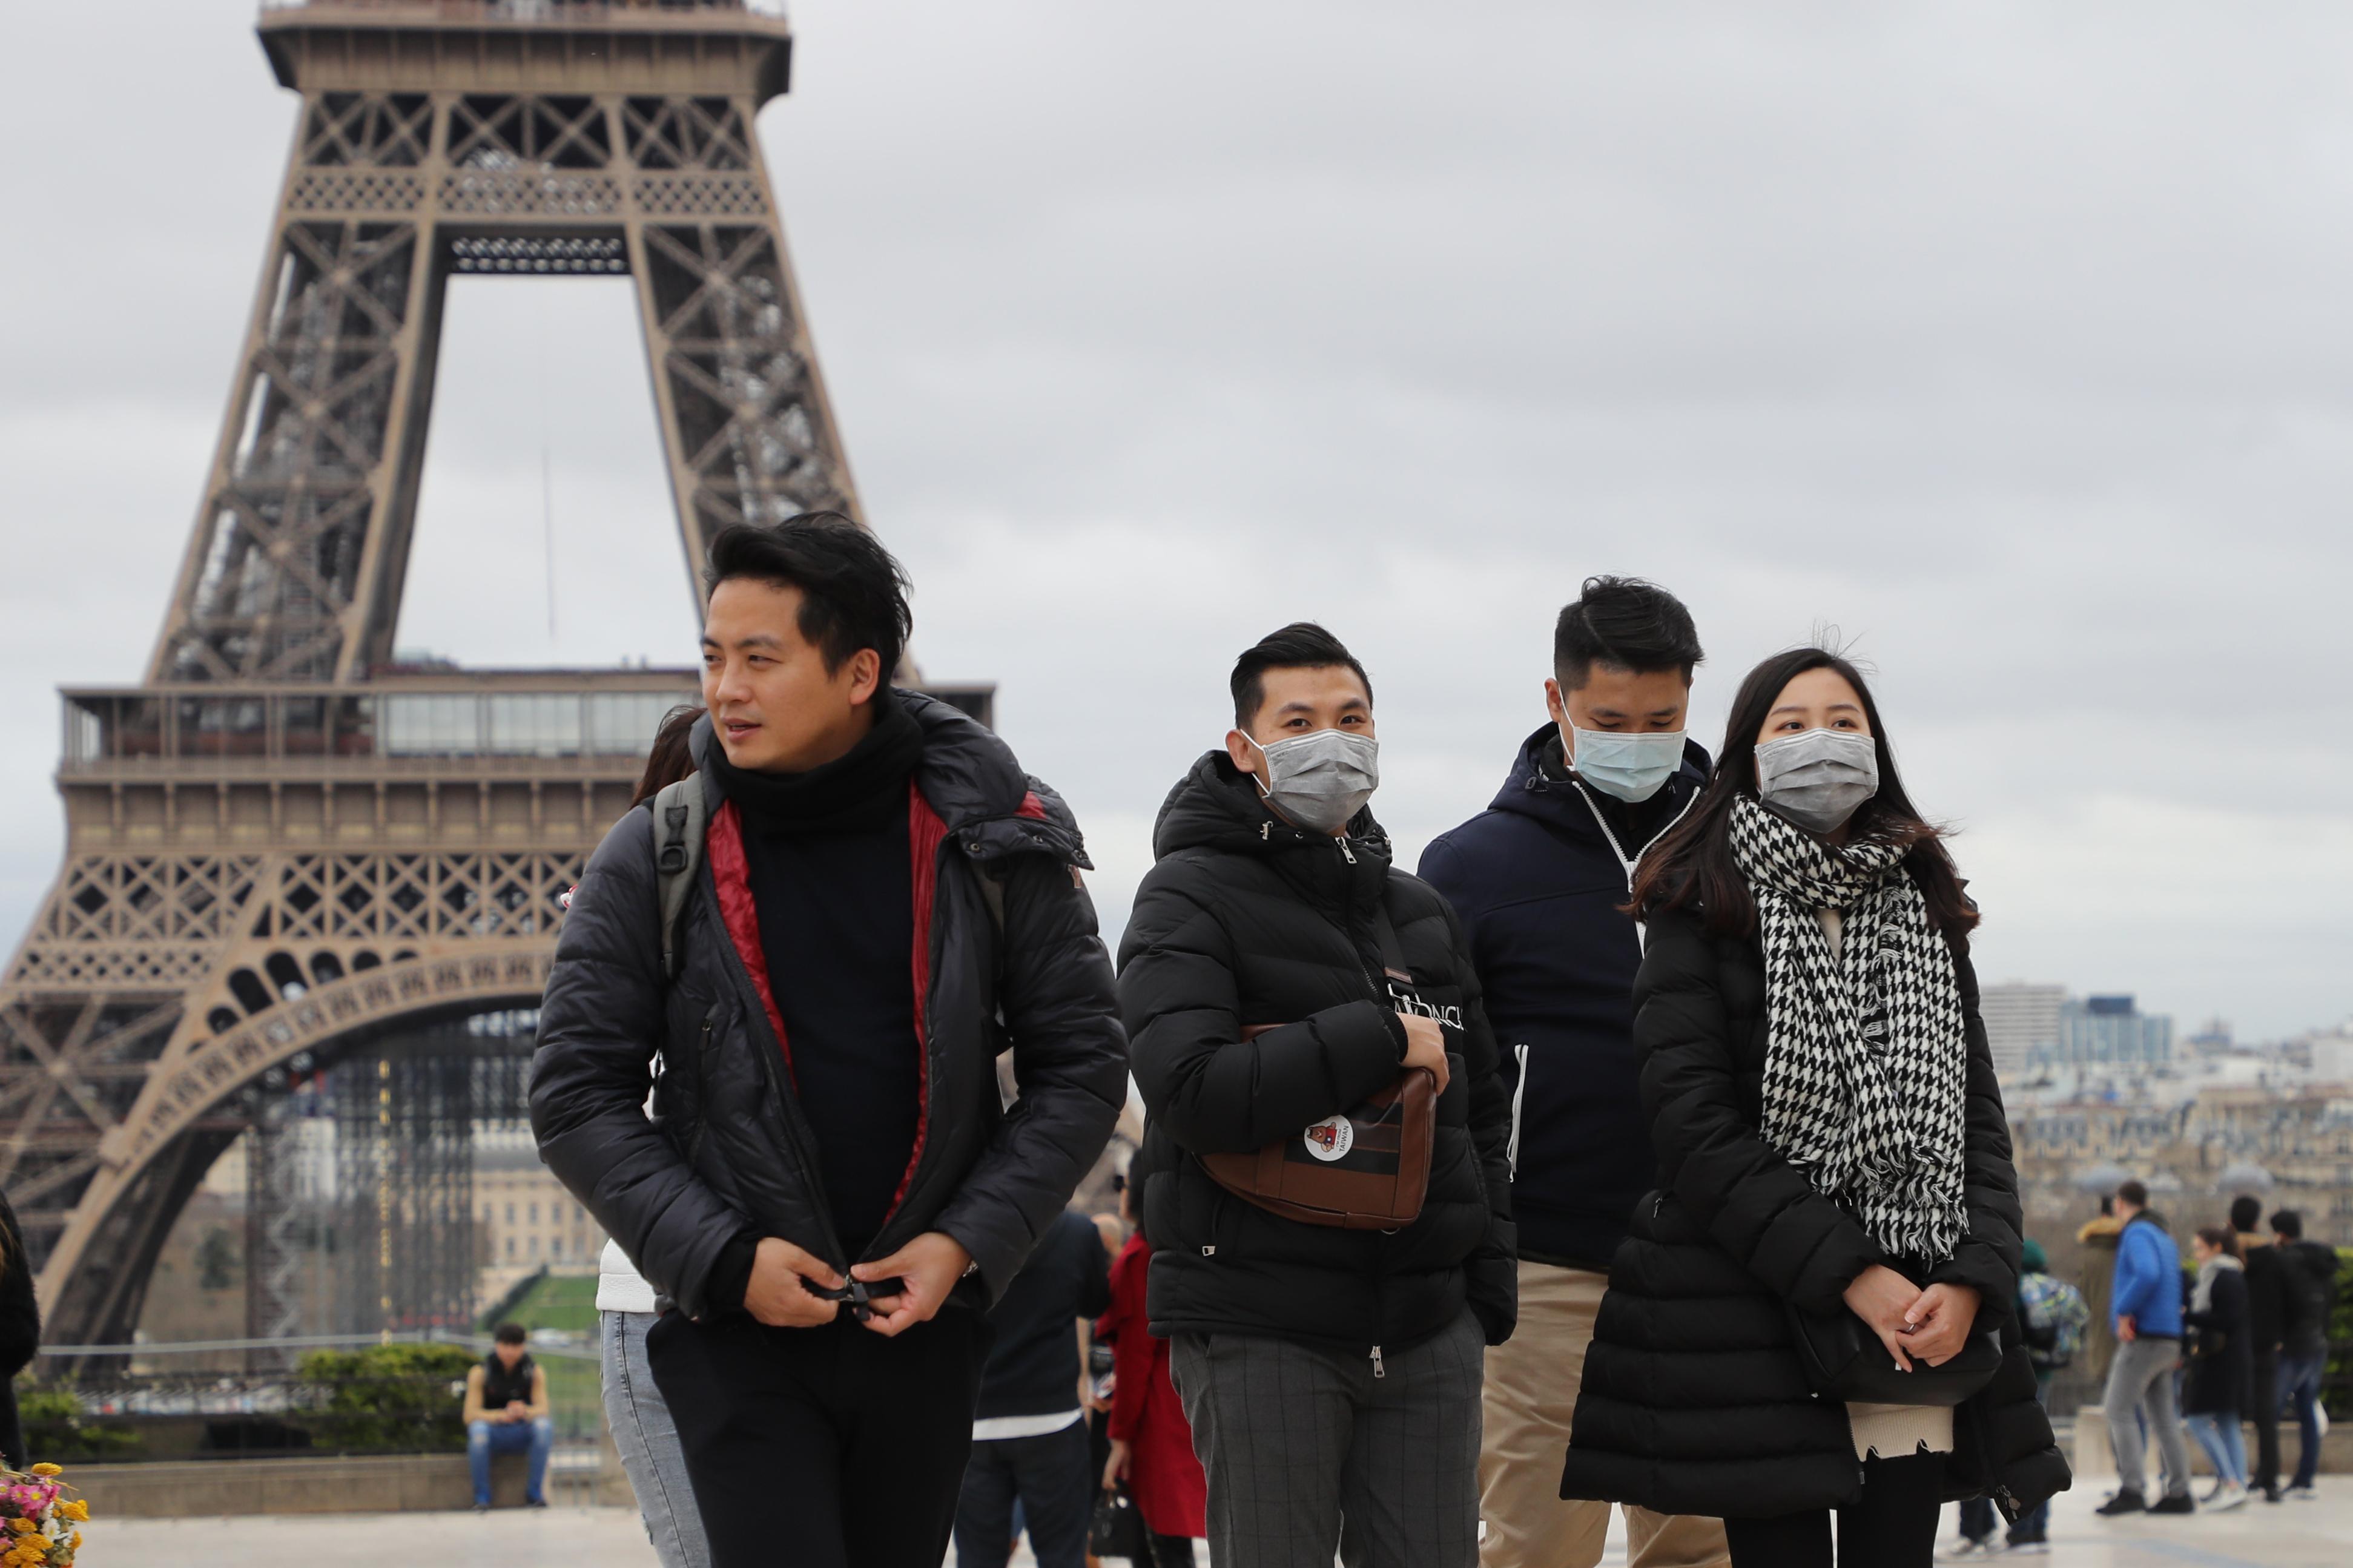 France confirms 2,281 coronavirus cases, fatalities at 48